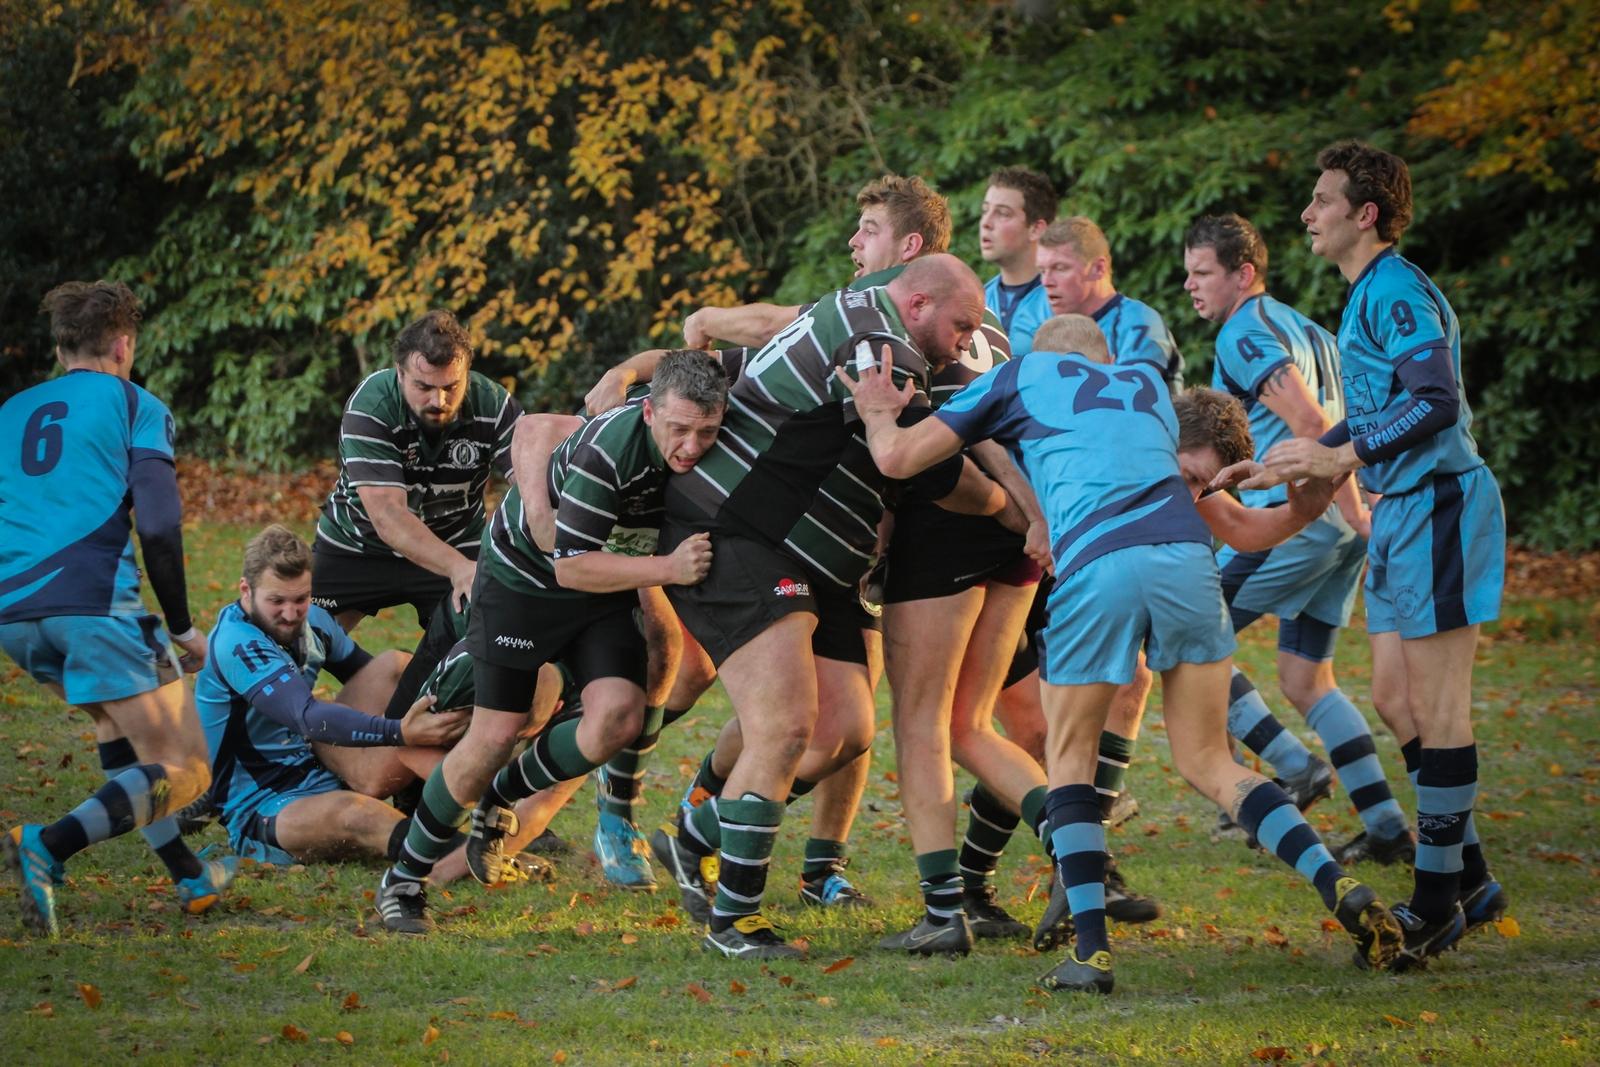 2014-11-22 | Pickwick Players – RCS | 36-14